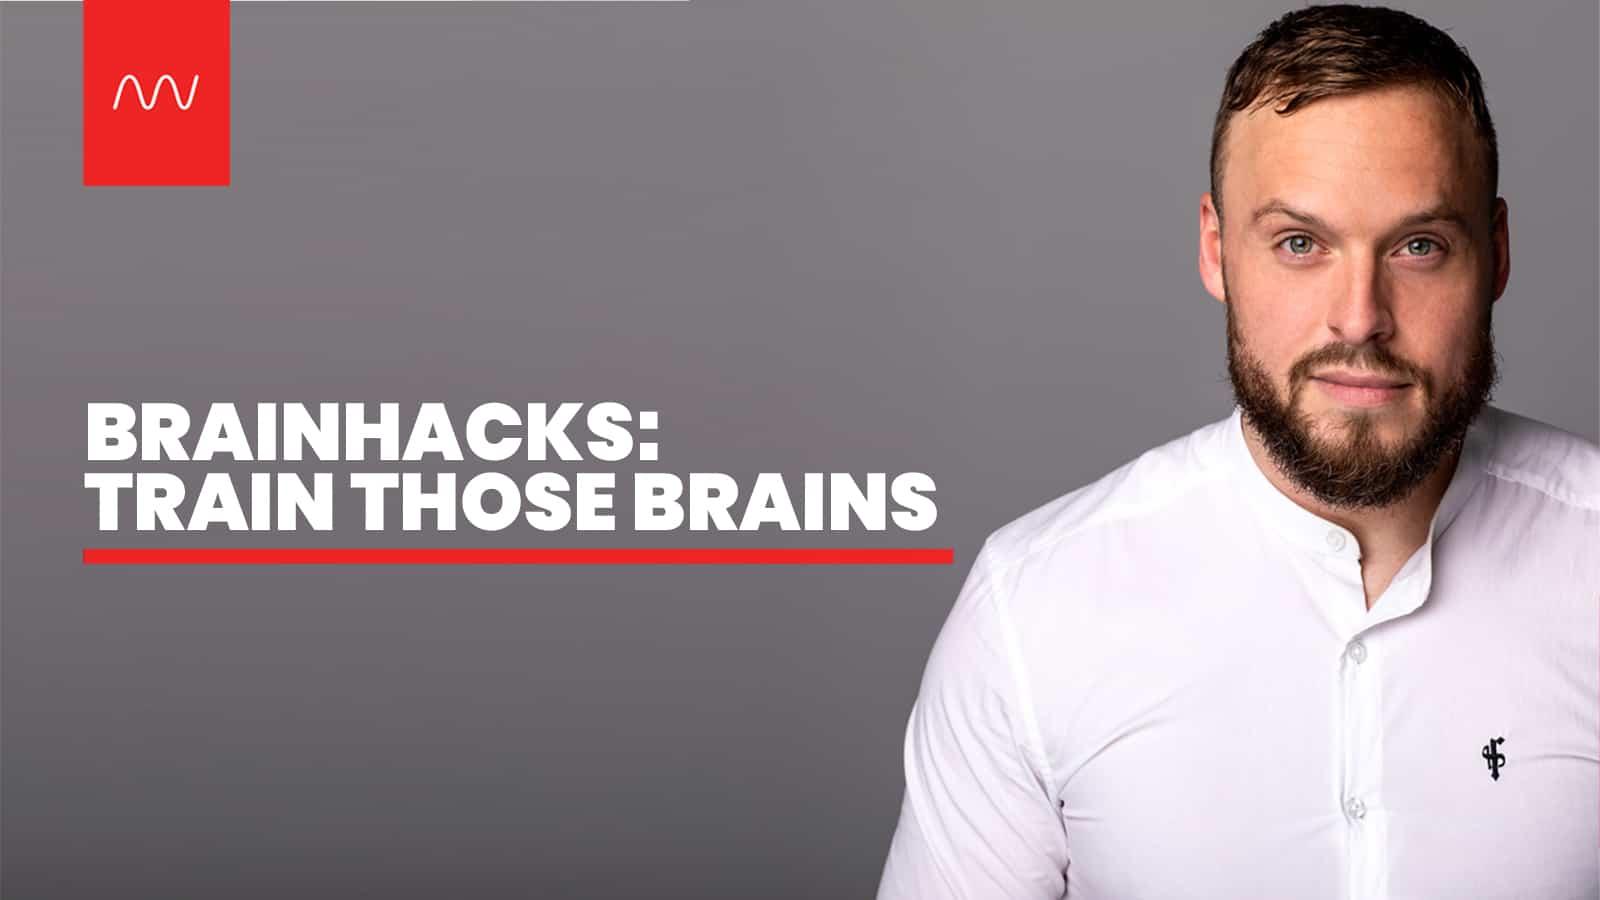 Brainhacks: train those brains